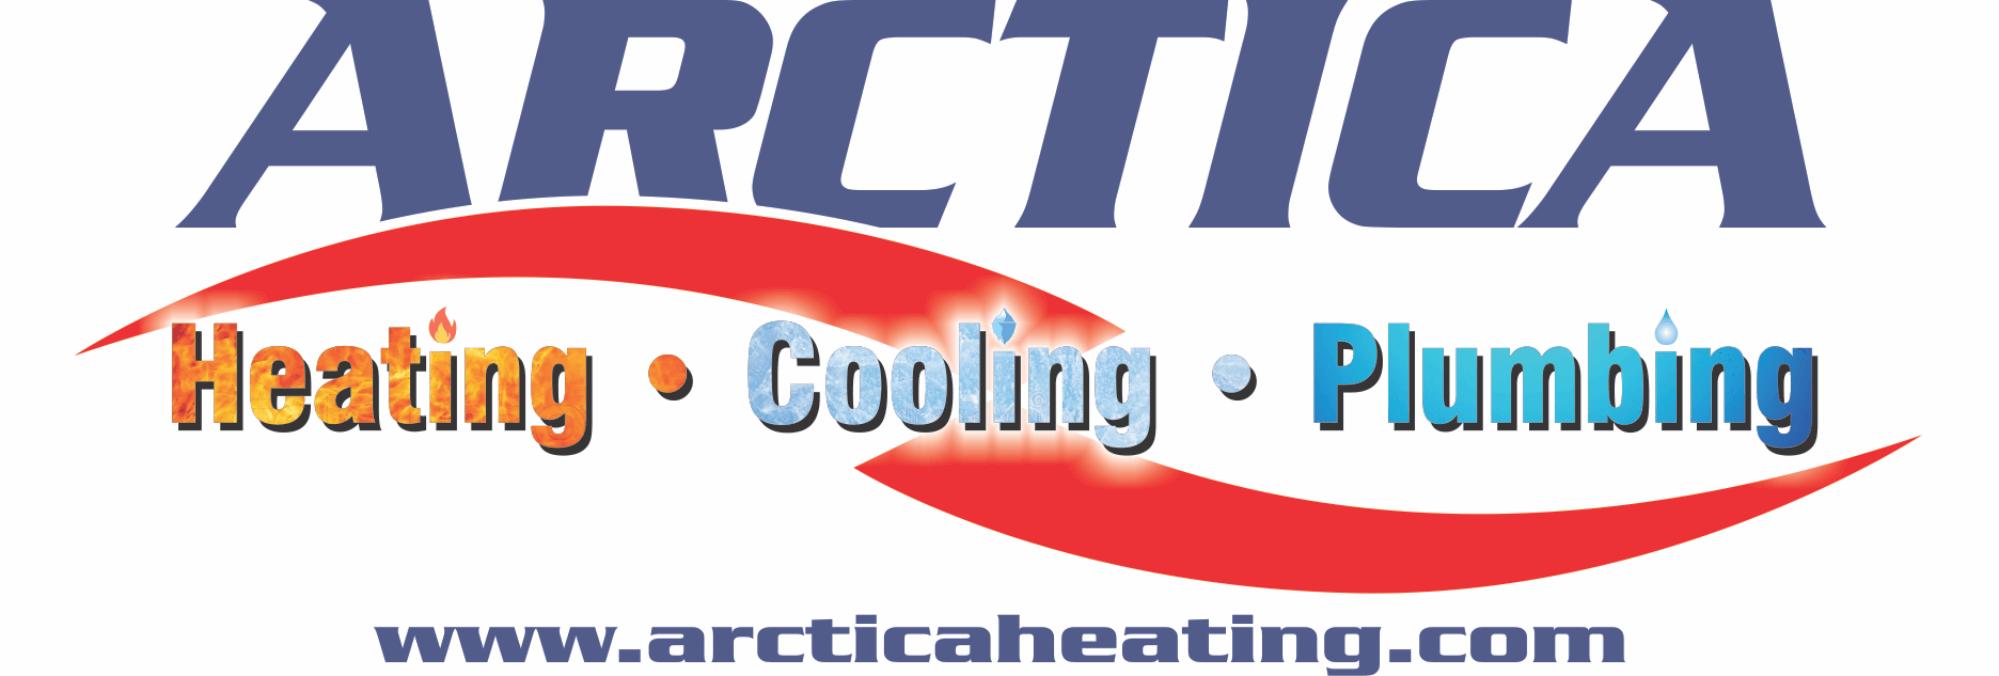 Arctica Heating and Cooling Logo Design, website design, Branding, Marketing, Website Maintenance and Hosting